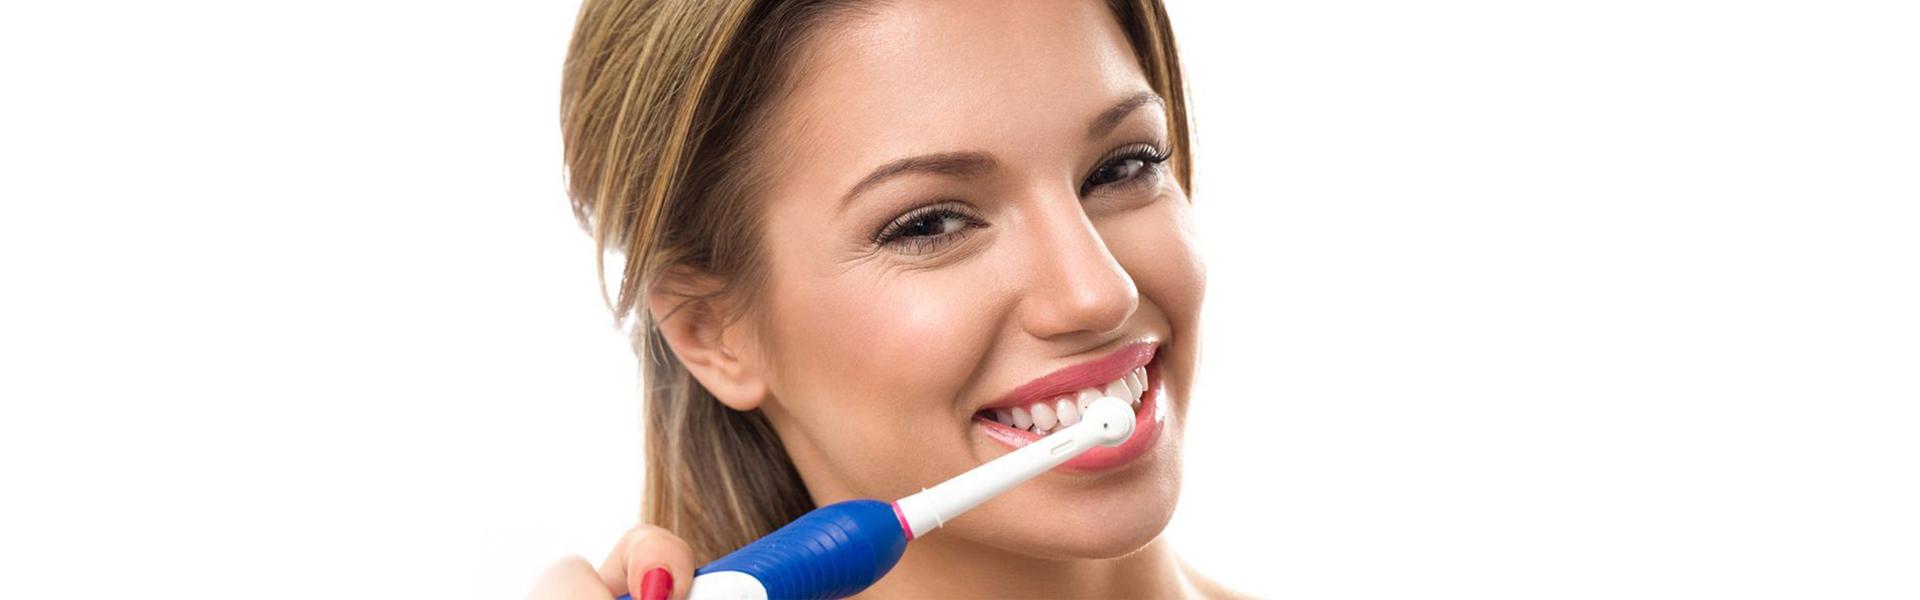 Benefits of Fluoride Varnish Treatment